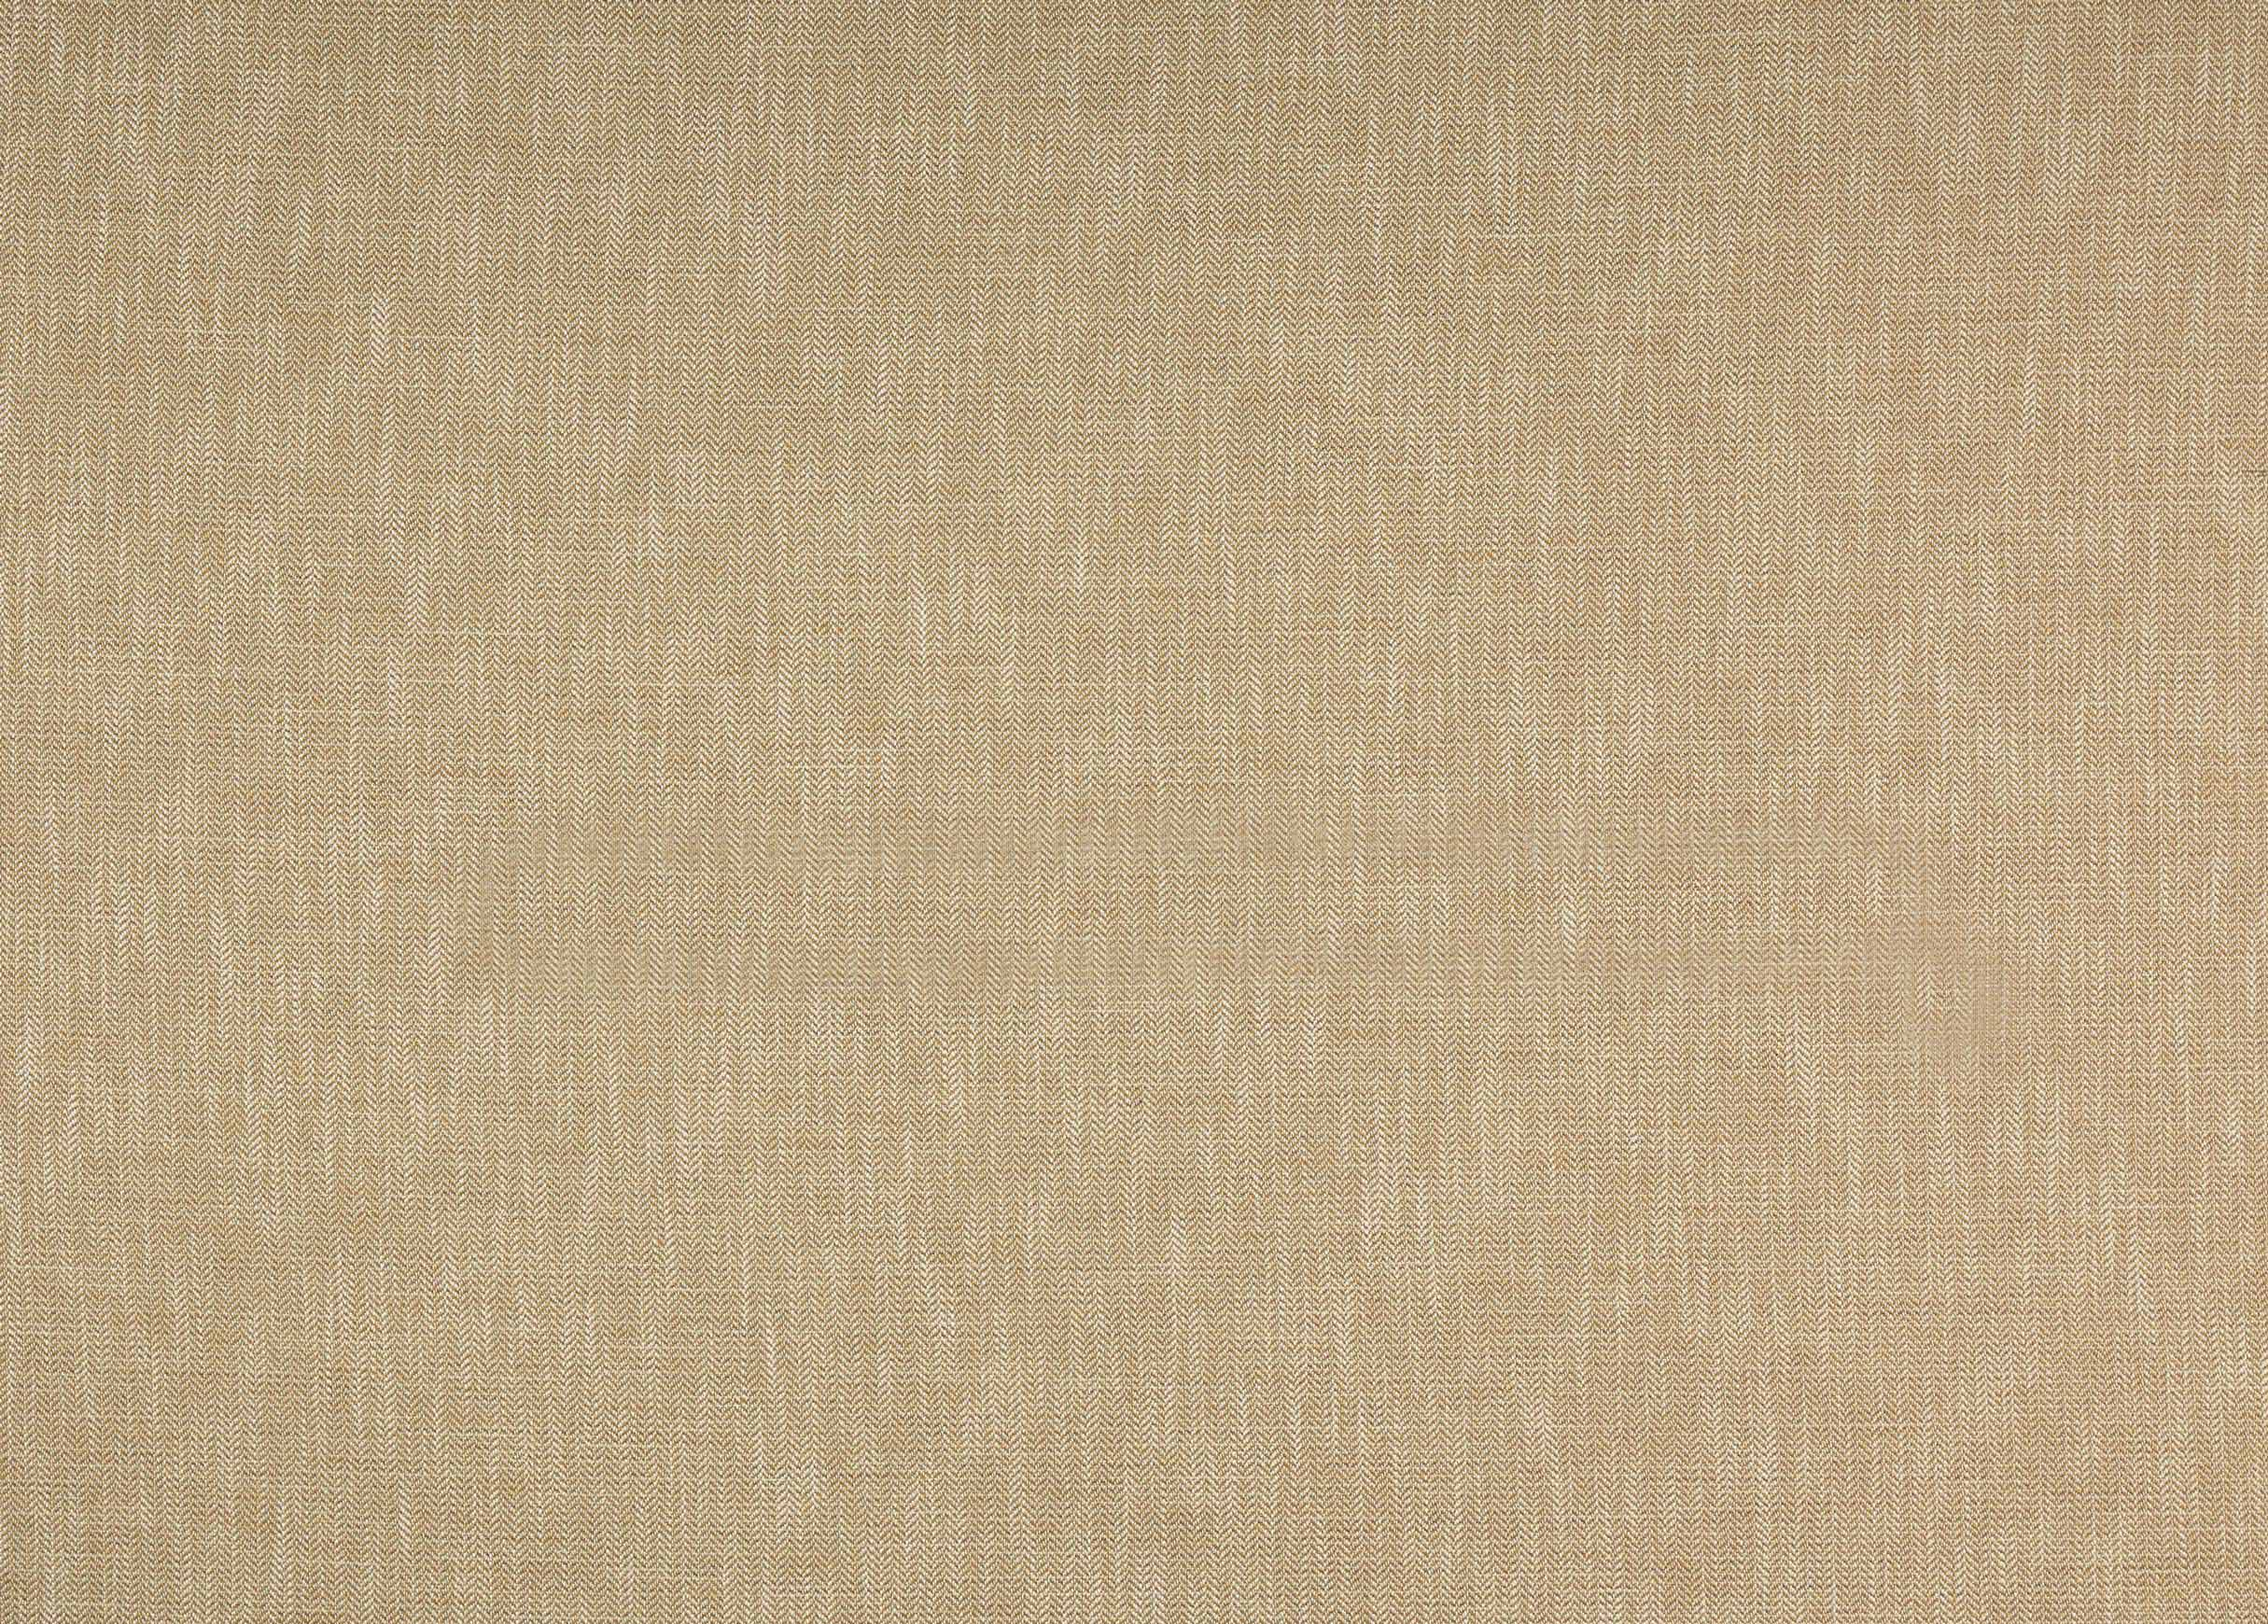 Borini Straw Fabrics Ethan Allen